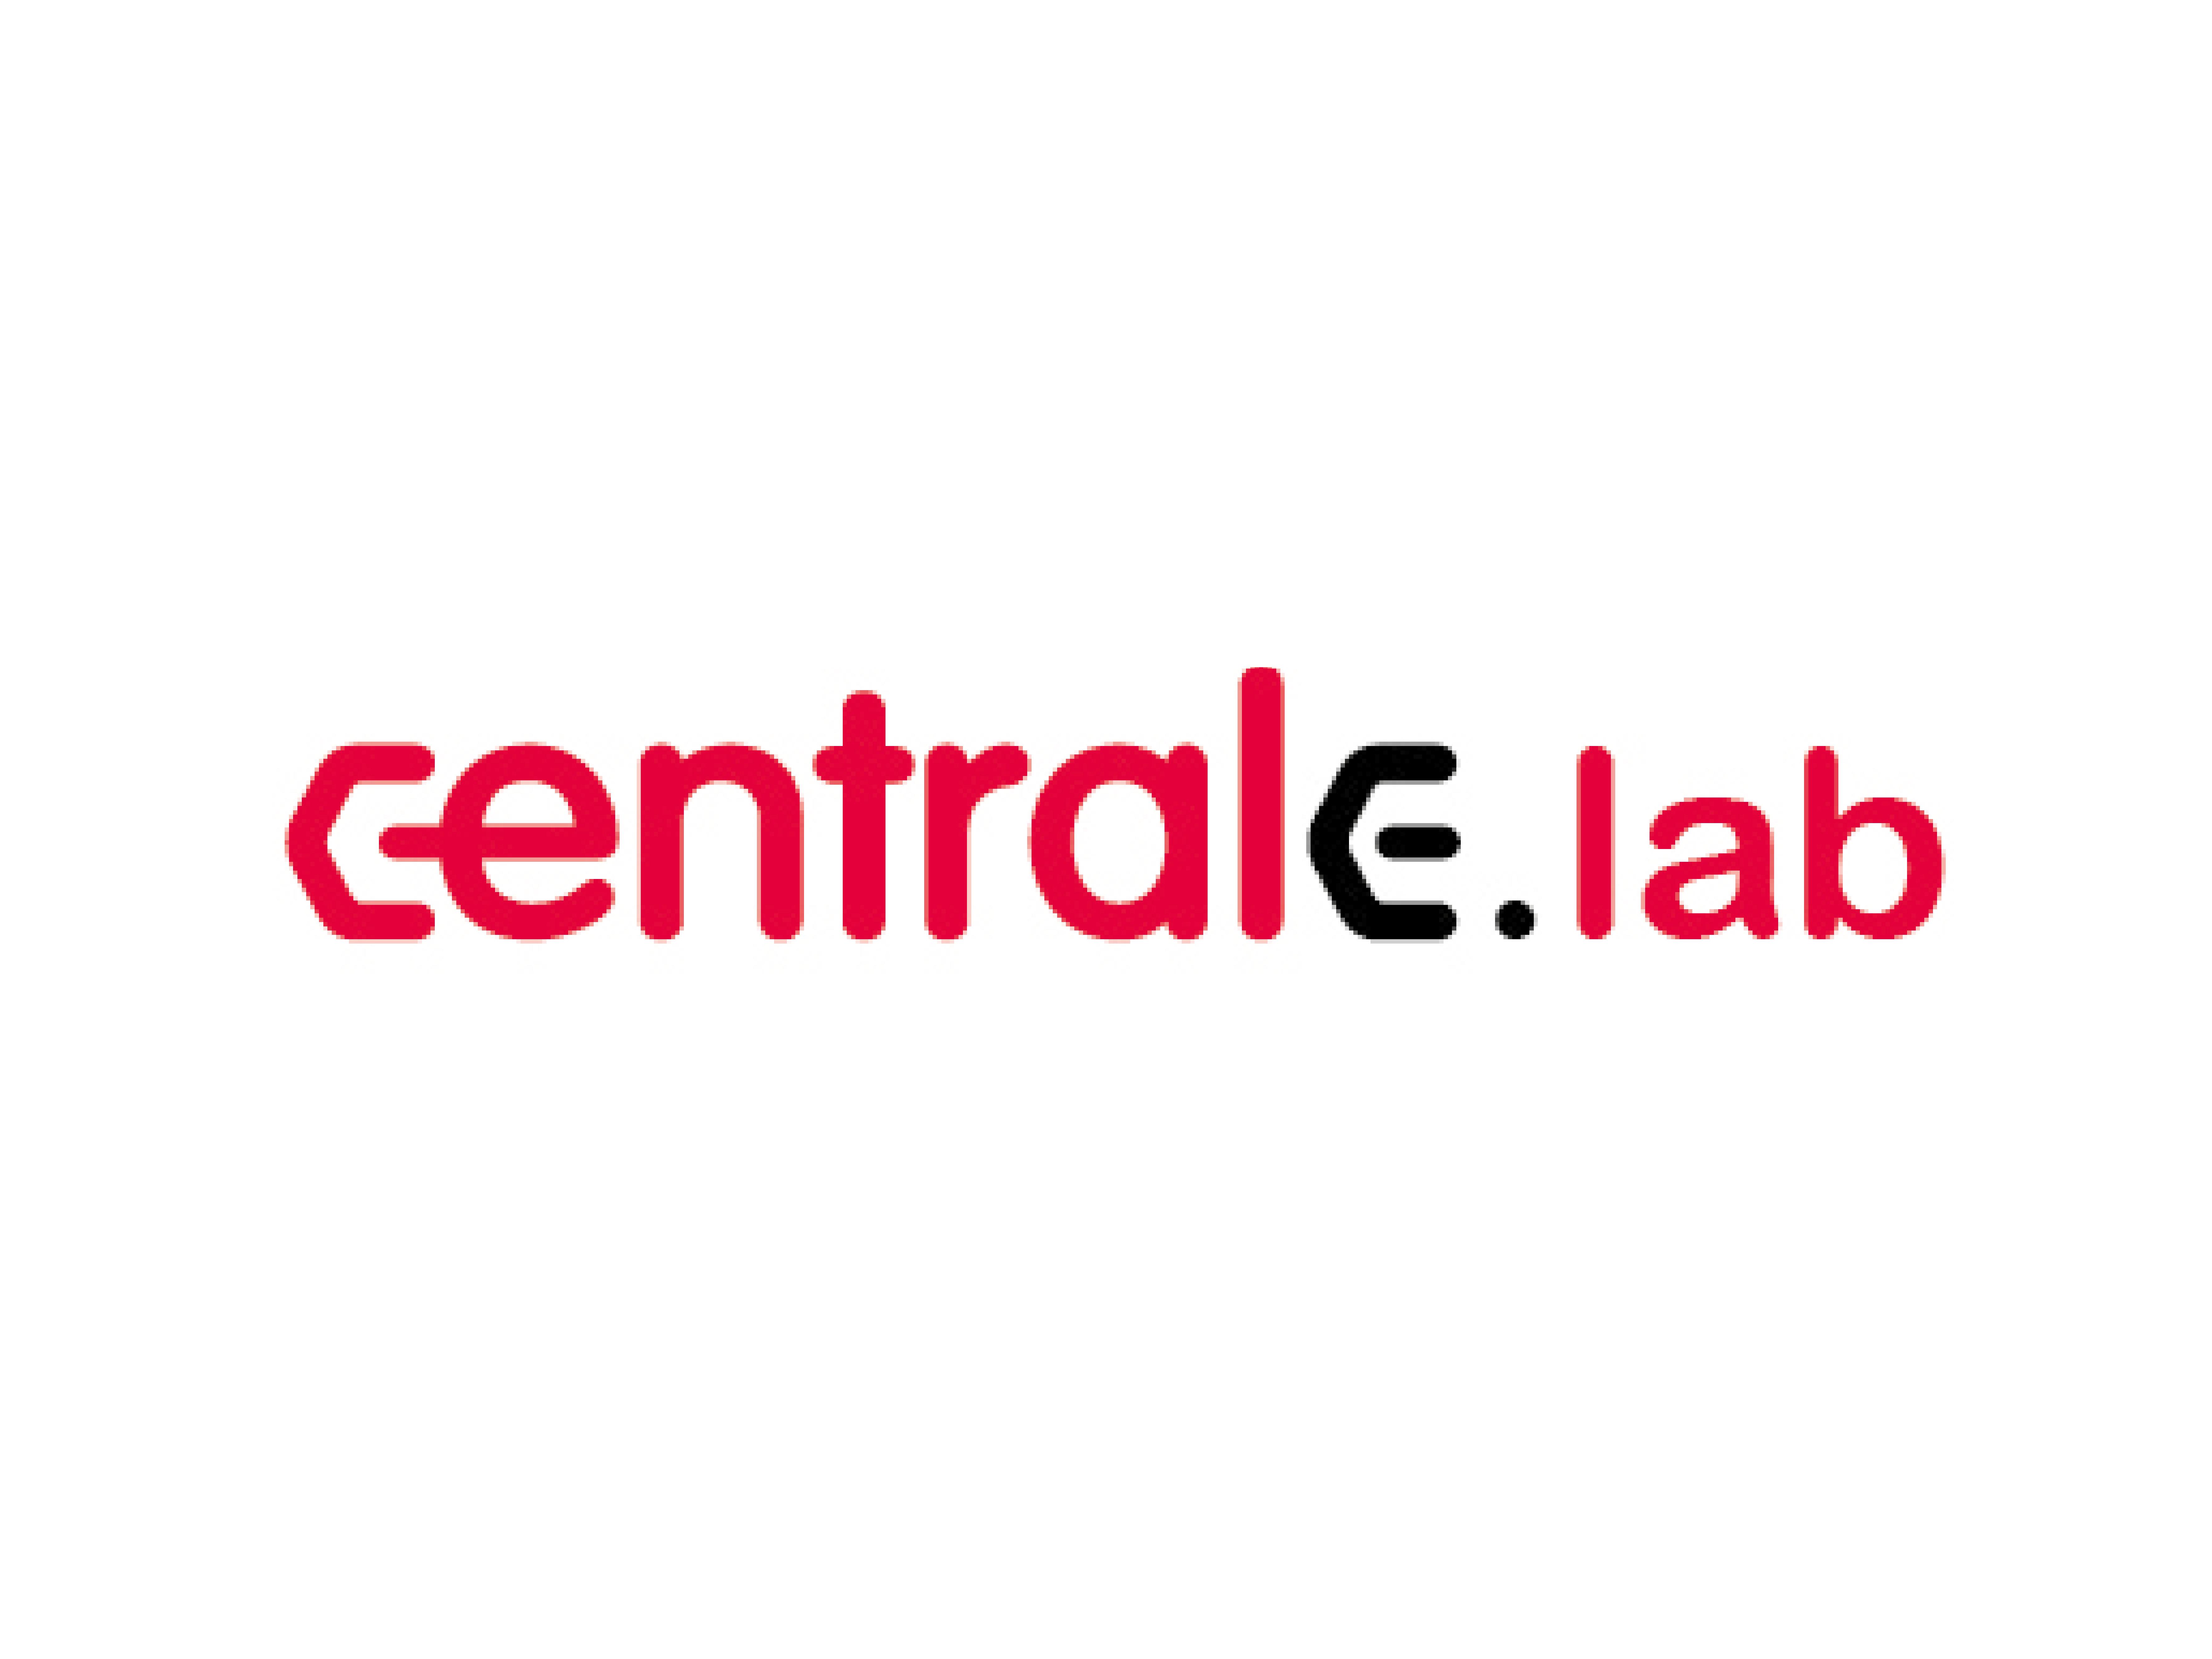 CENTRALE.lab